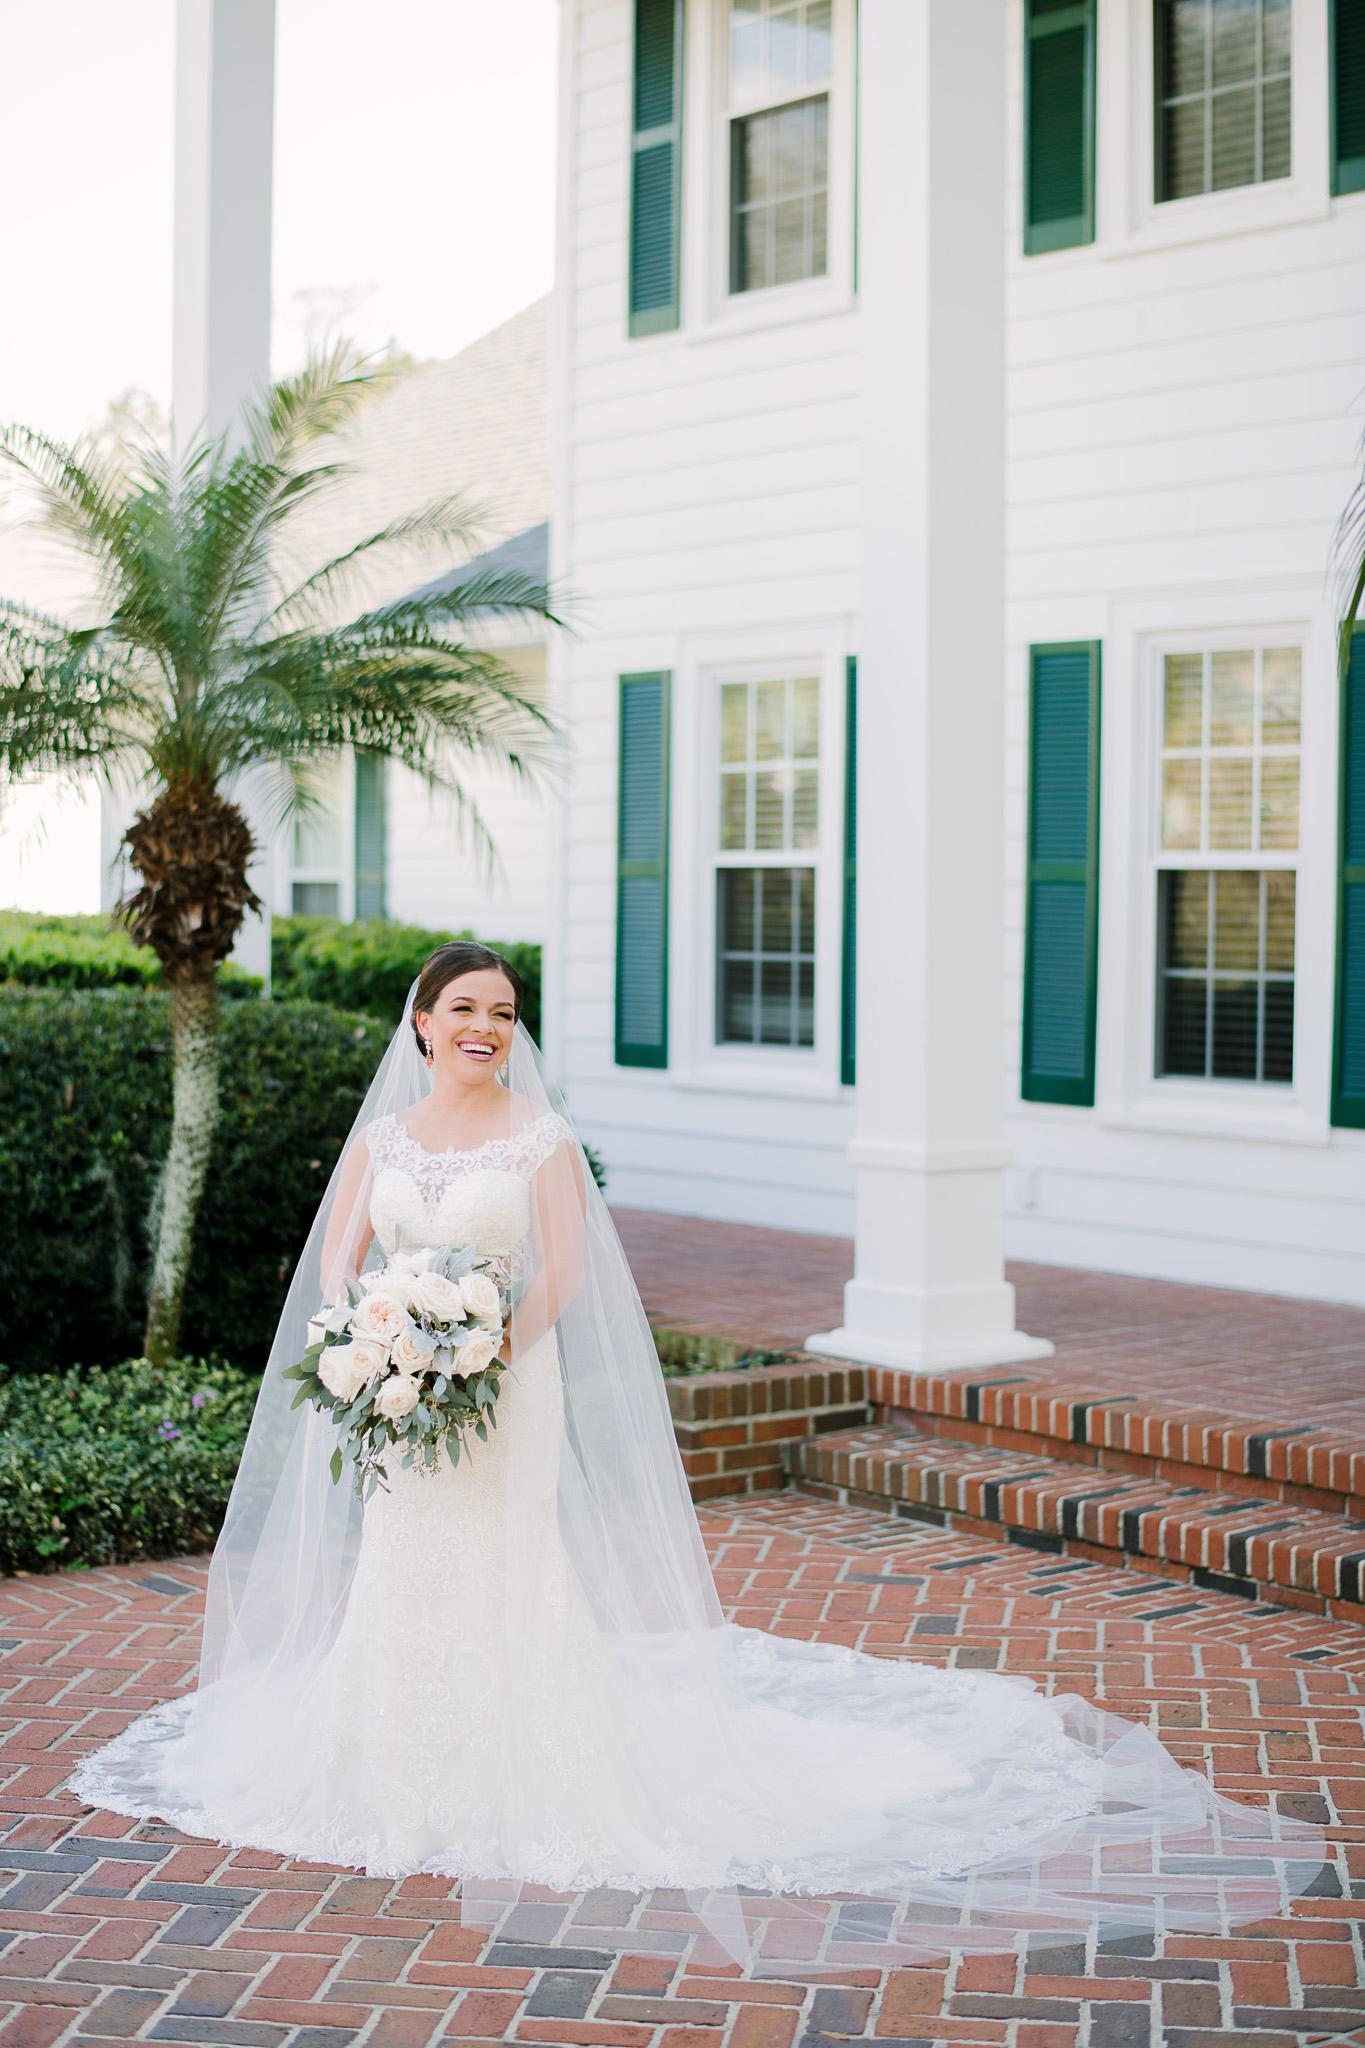 Orlando Wedding Planner Blue Ribbon Weddings  Wedding Photographer Sunglow Photography, Dustin Prickett  Orlando Wedding Venue Cypress Grove Estate House Ceremony & Reception